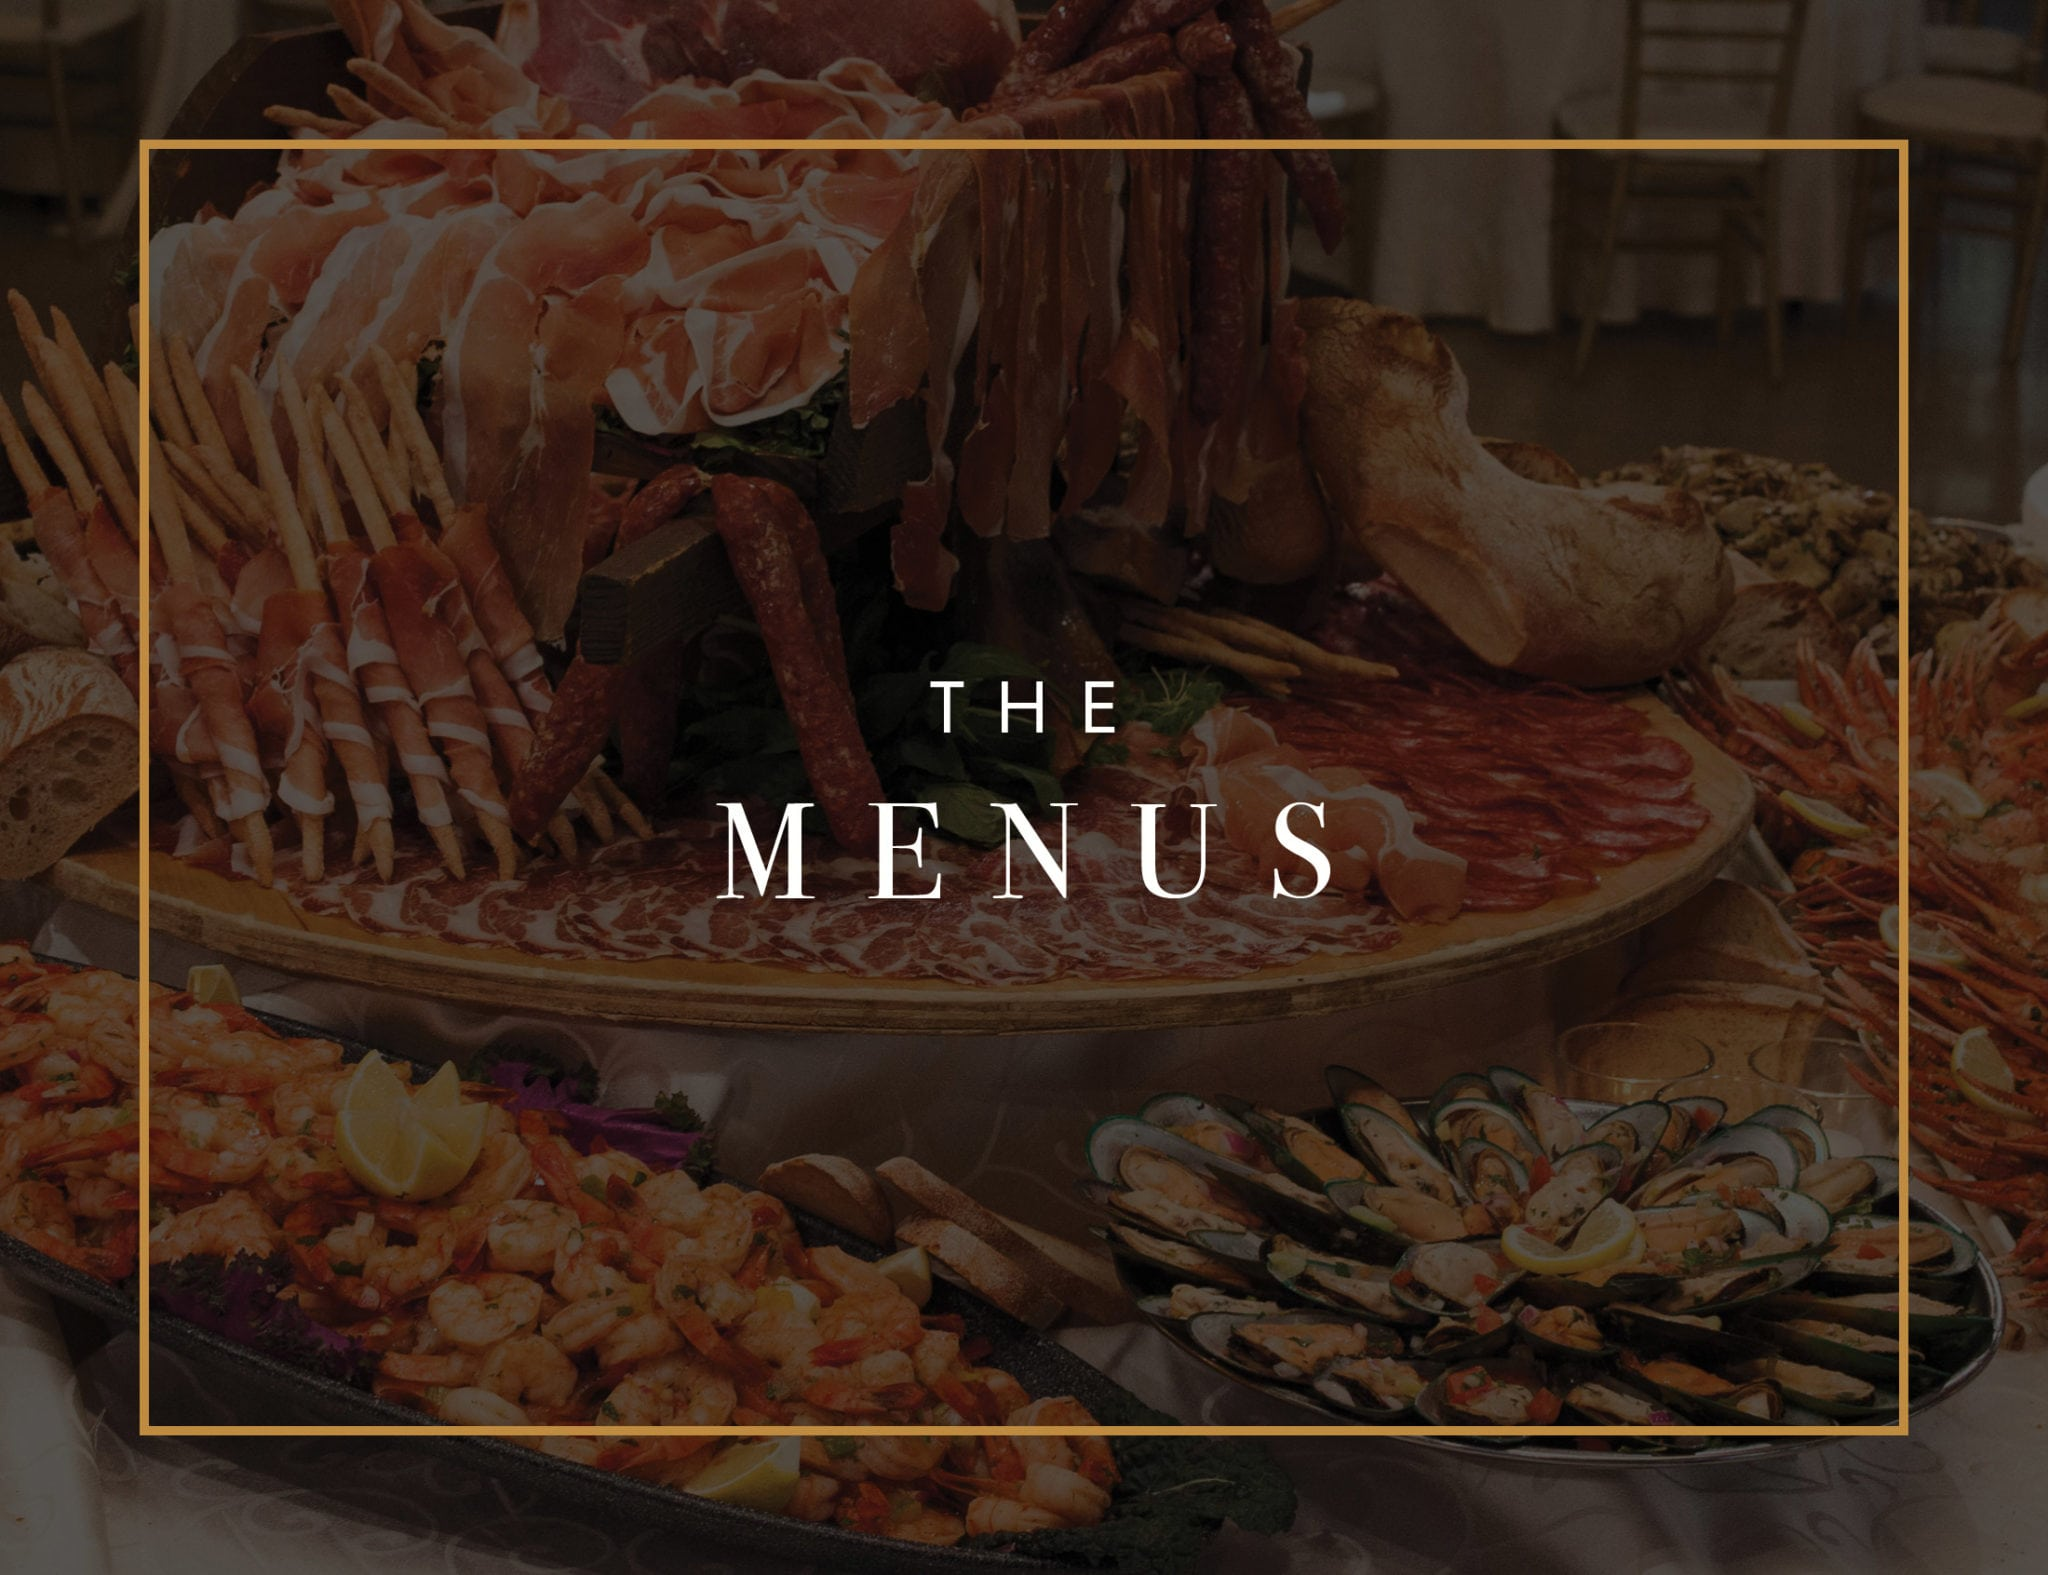 LIUNA Station menu - Supreme Antipasto & Buffets